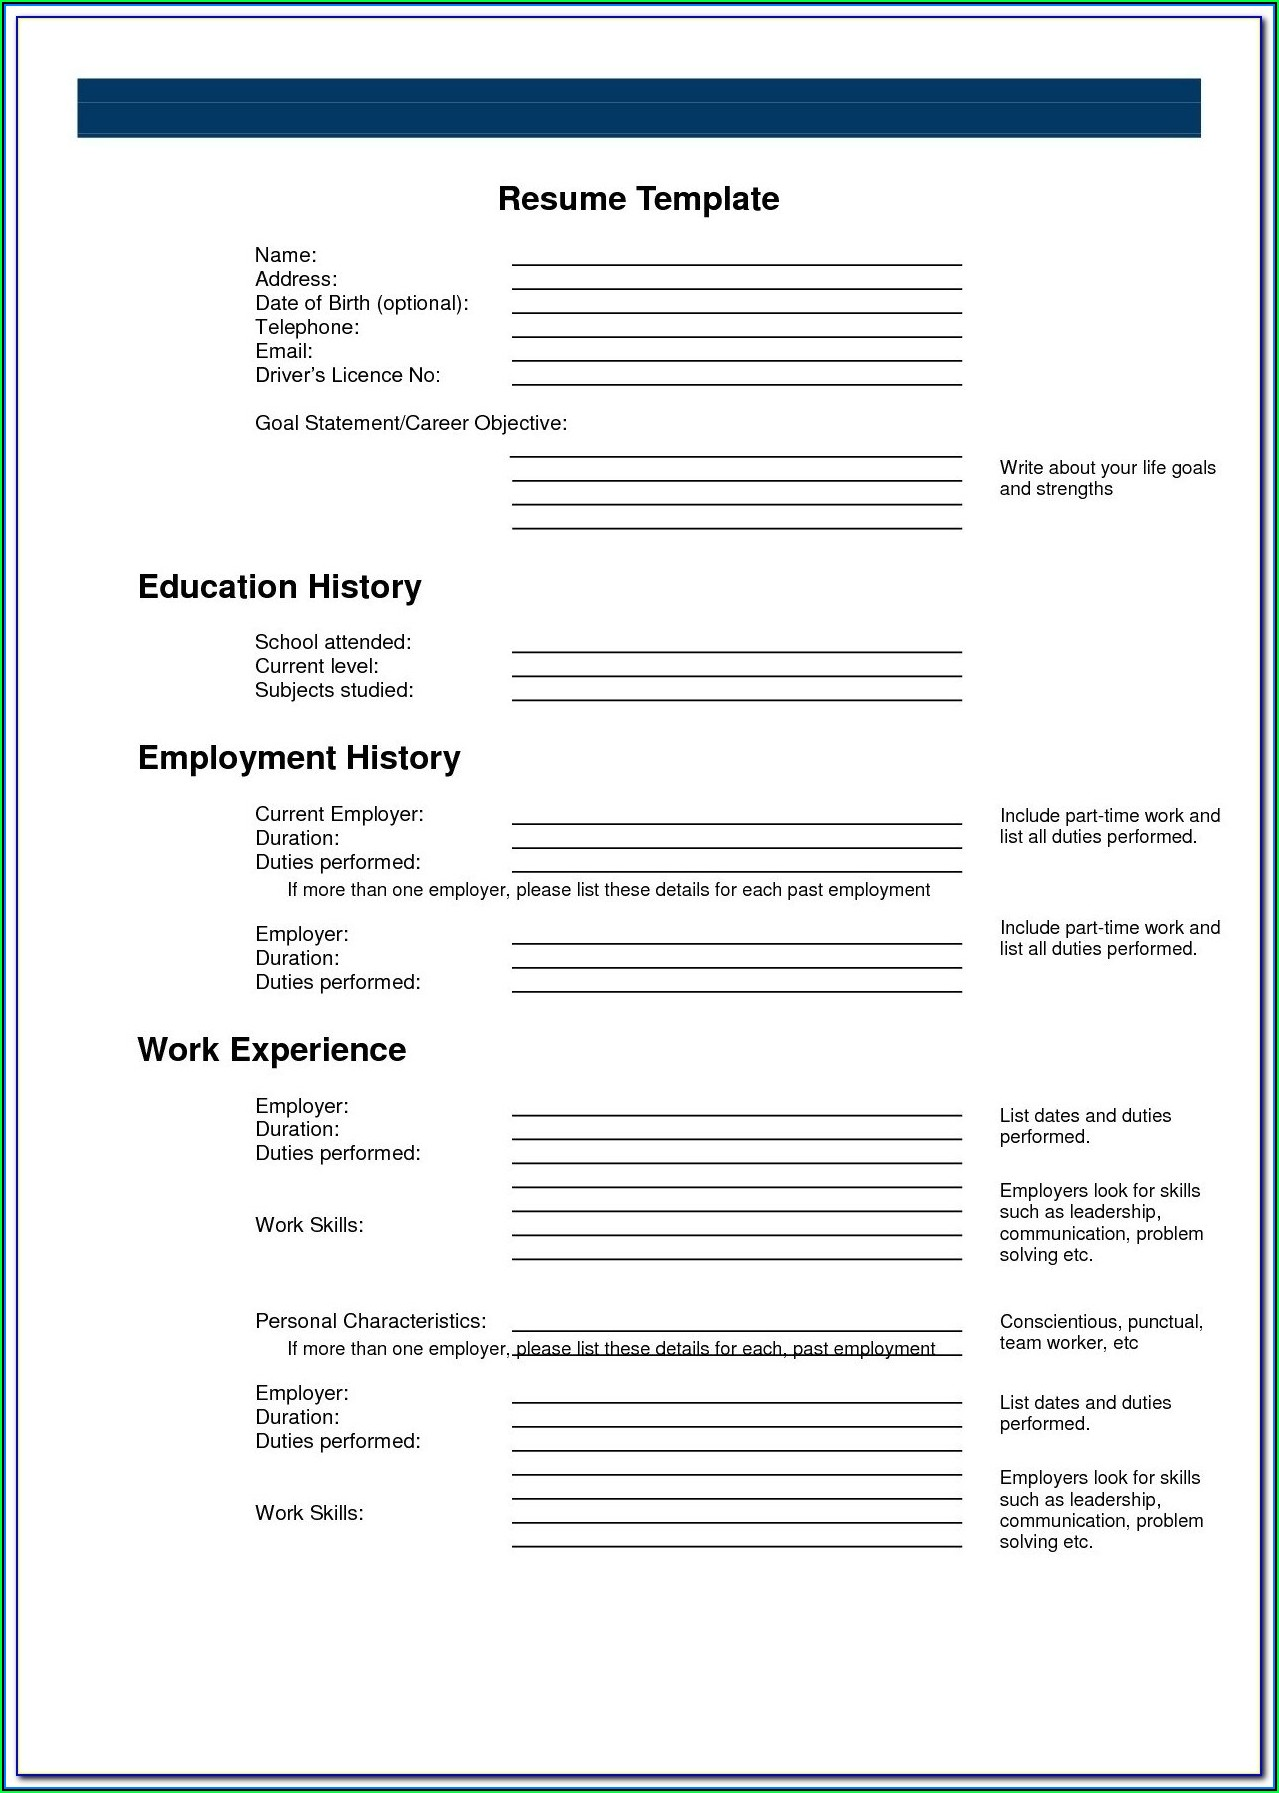 Free Plain Text Resume Builder